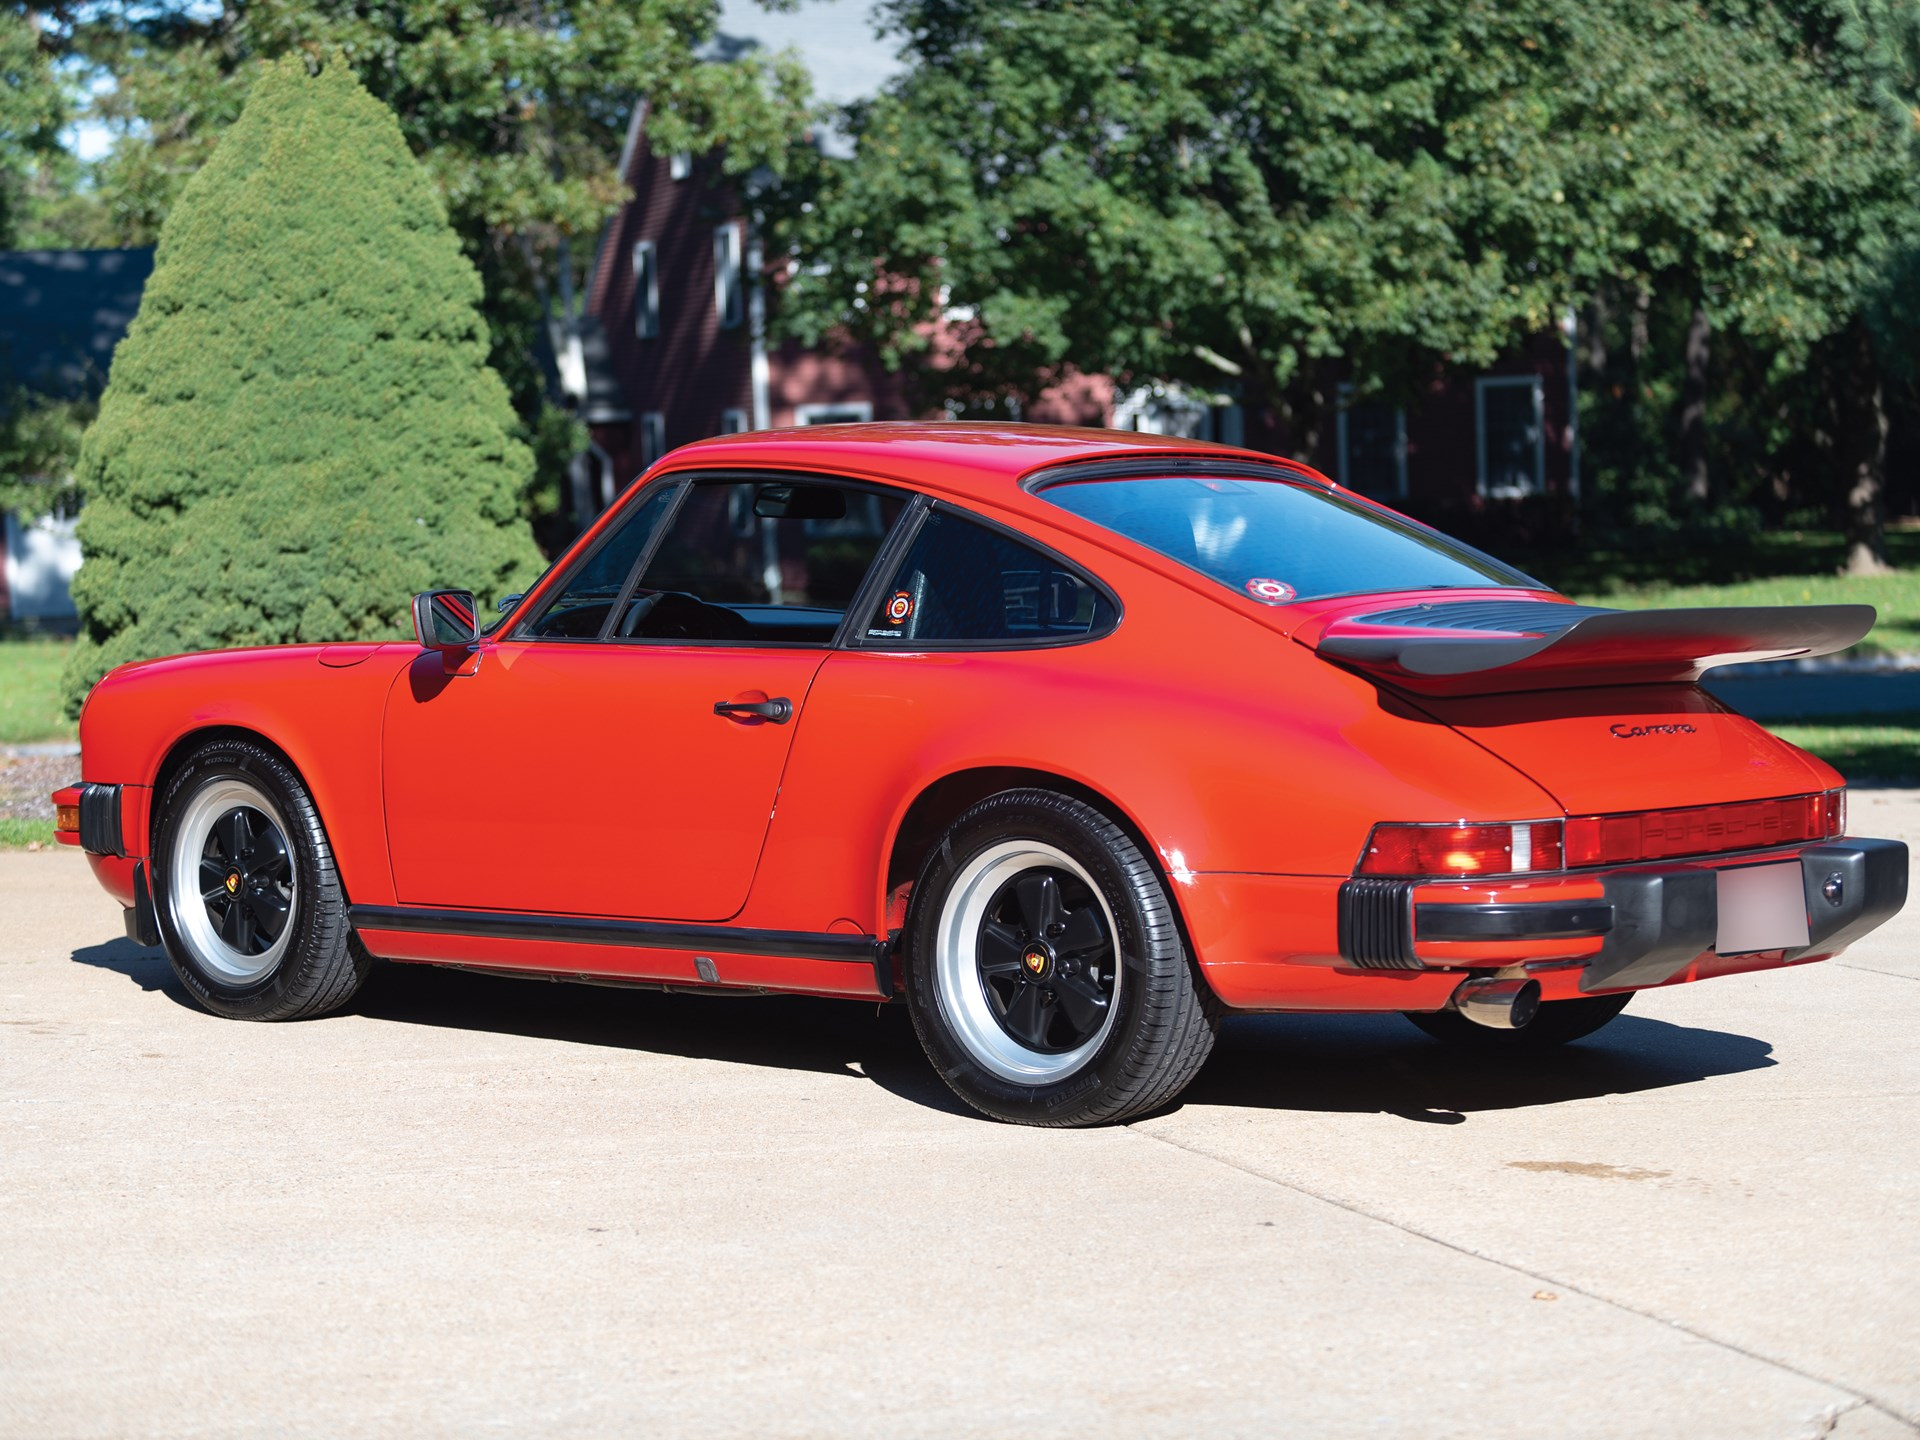 1988 Porsche 911 >> Rm Sotheby S 1988 Porsche 911 Carrera Coupe Fort Lauderdale 2019